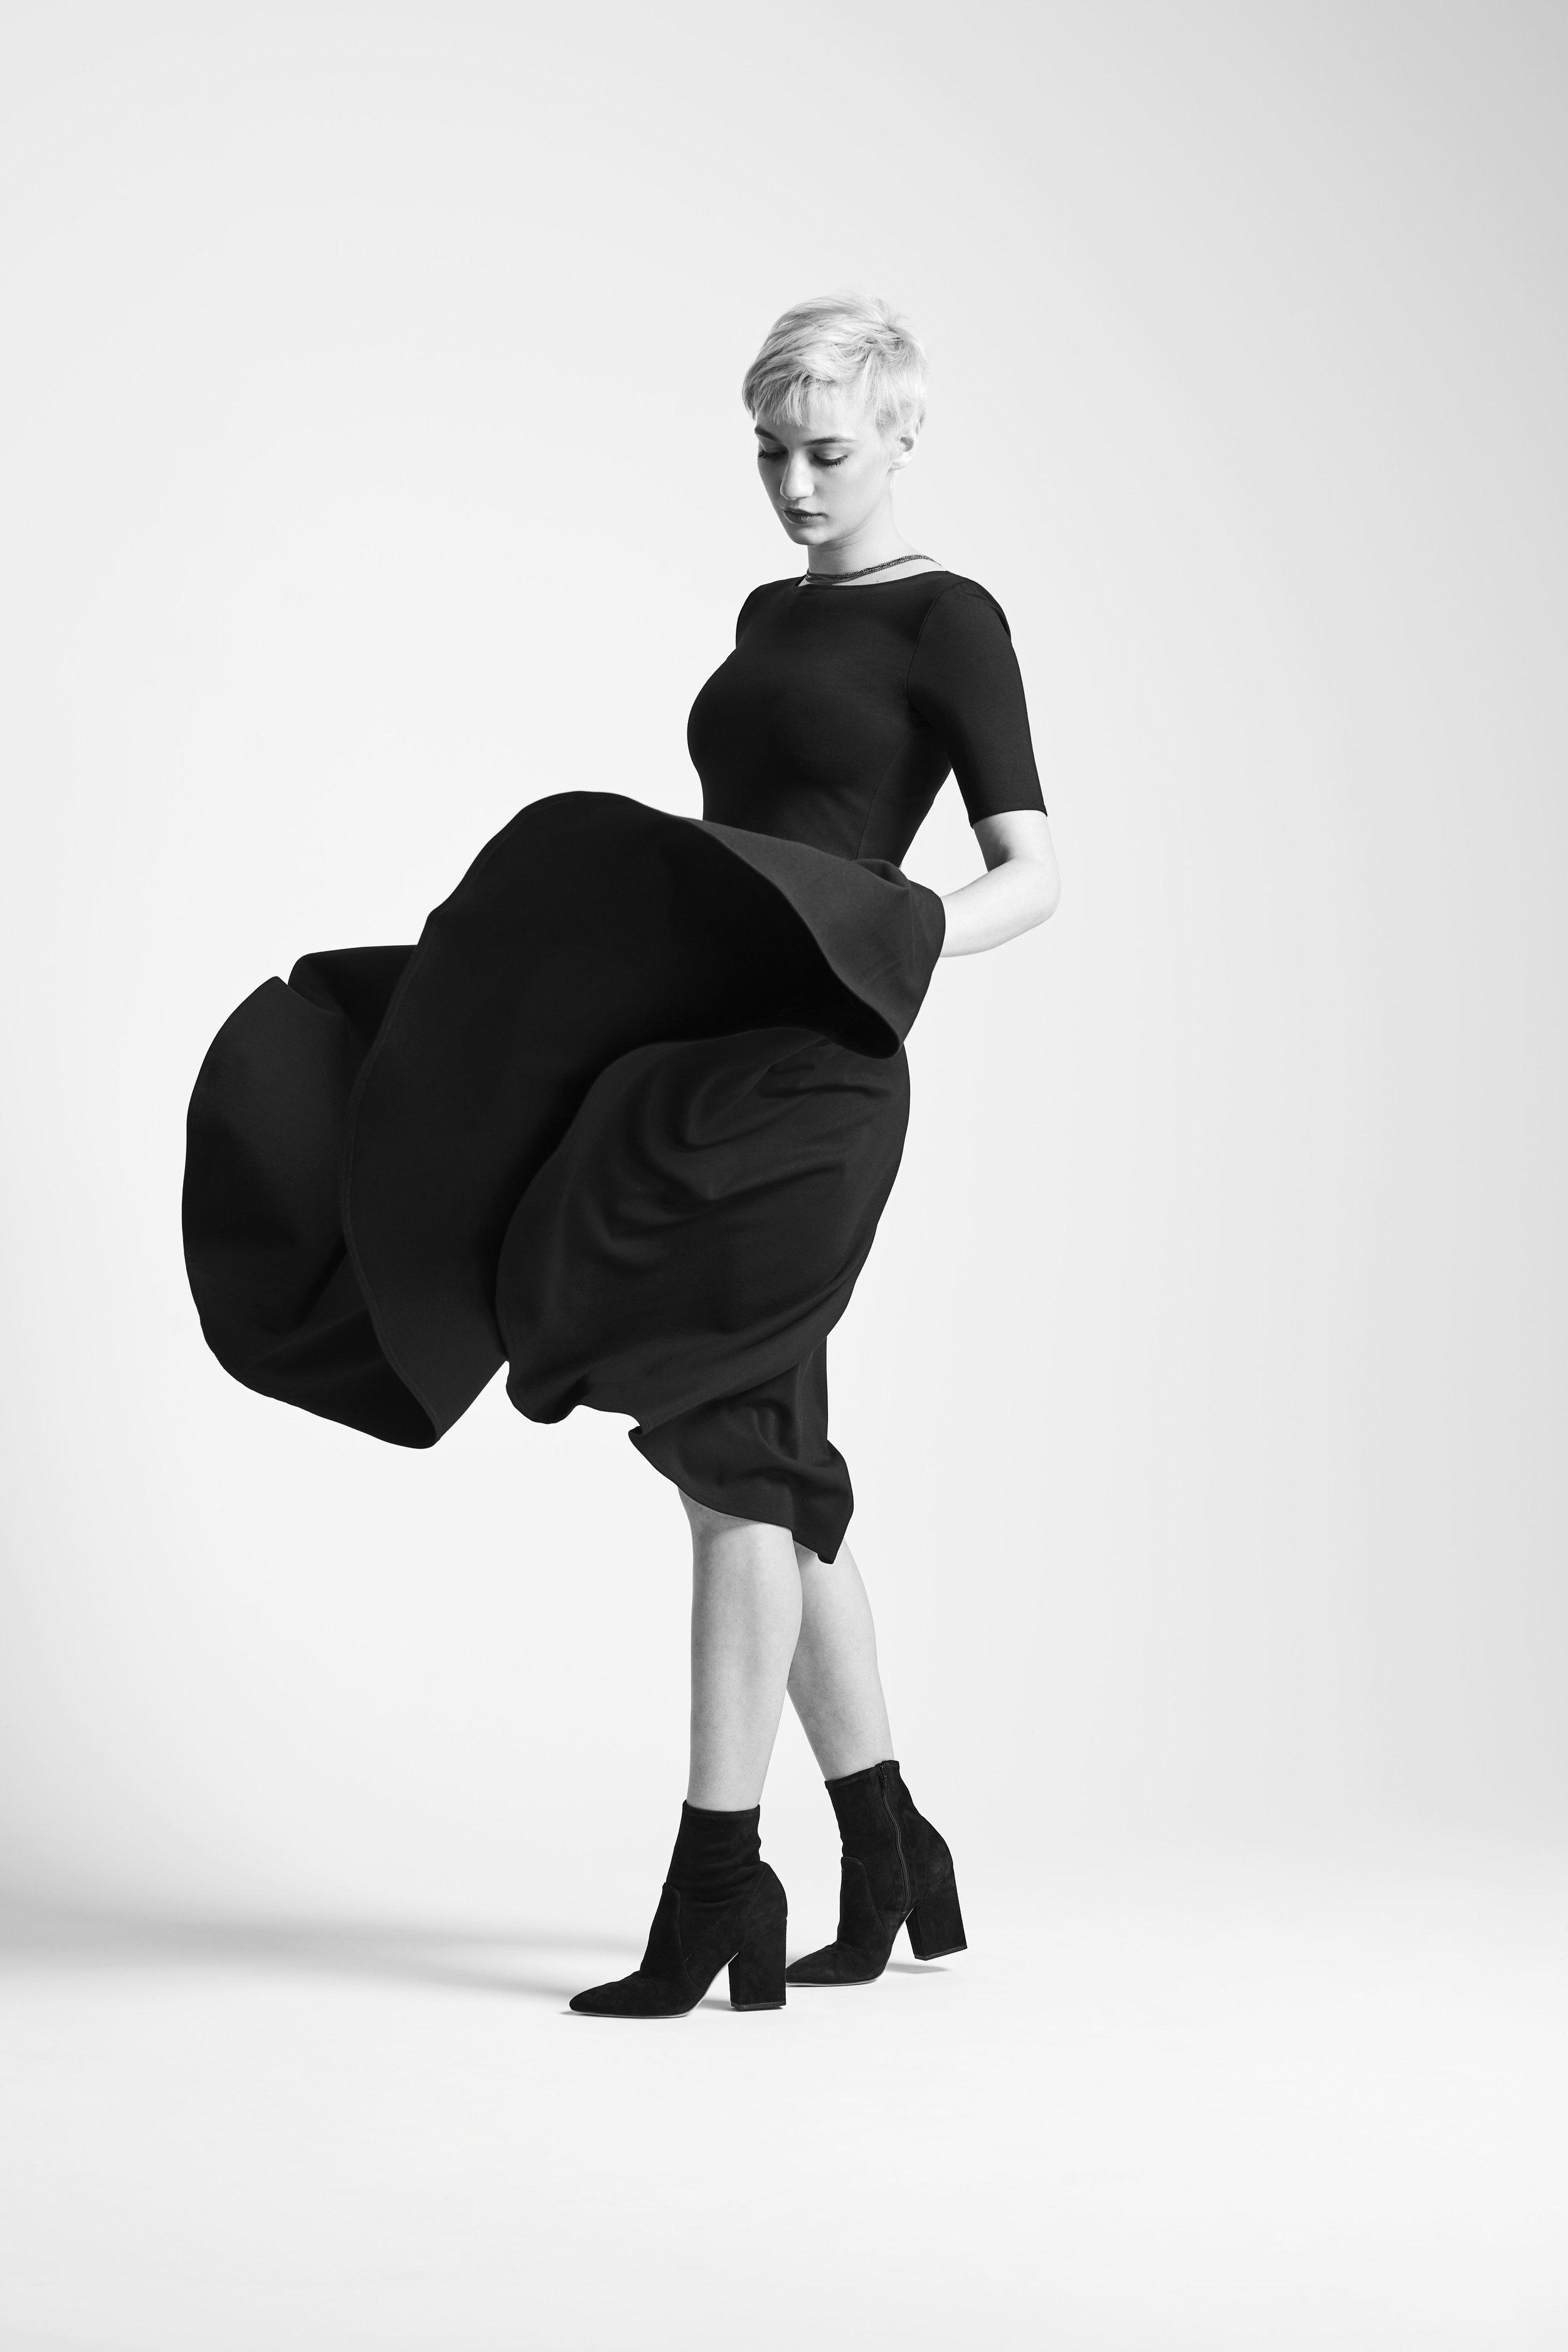 elisa-c-rossow/dress/dancing/s2 .jpg